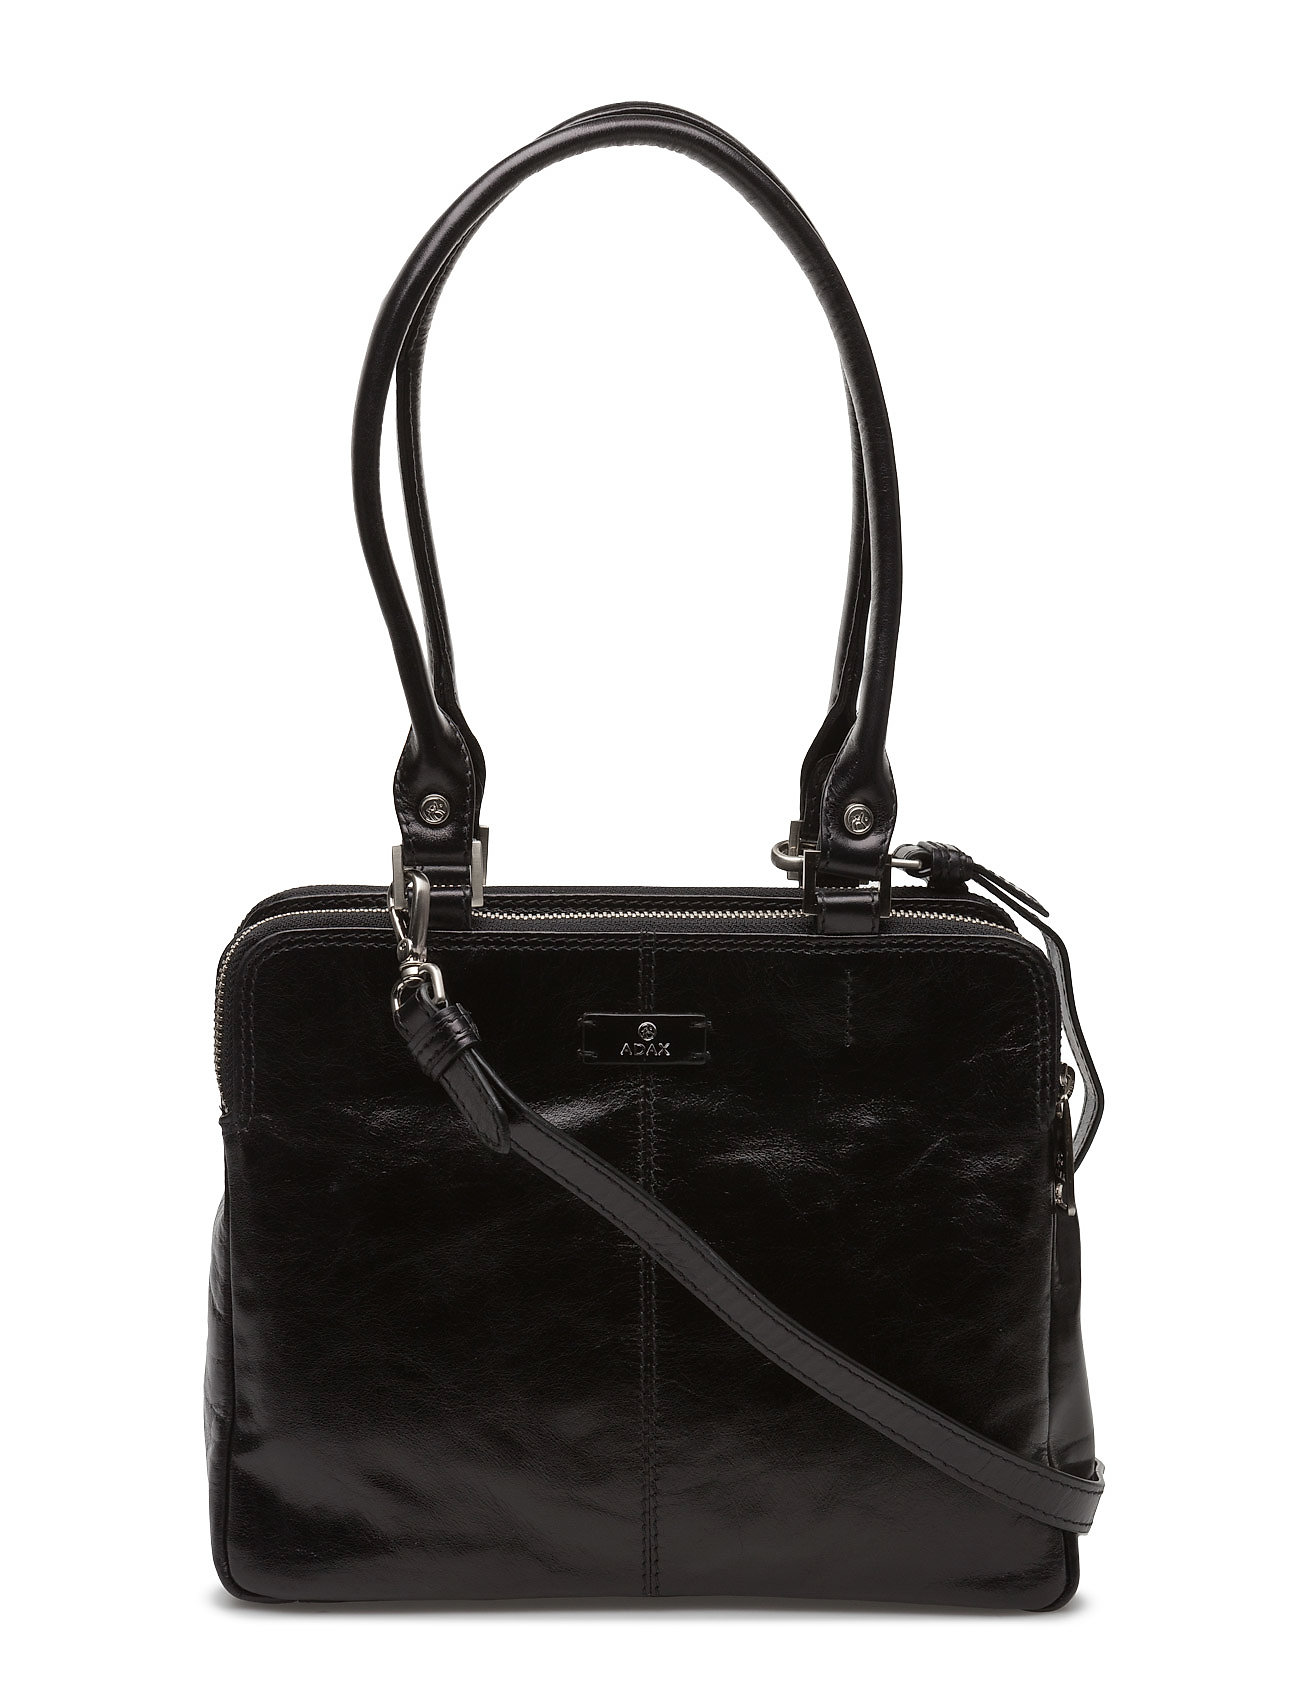 Salerno Handbag Tit - Adax